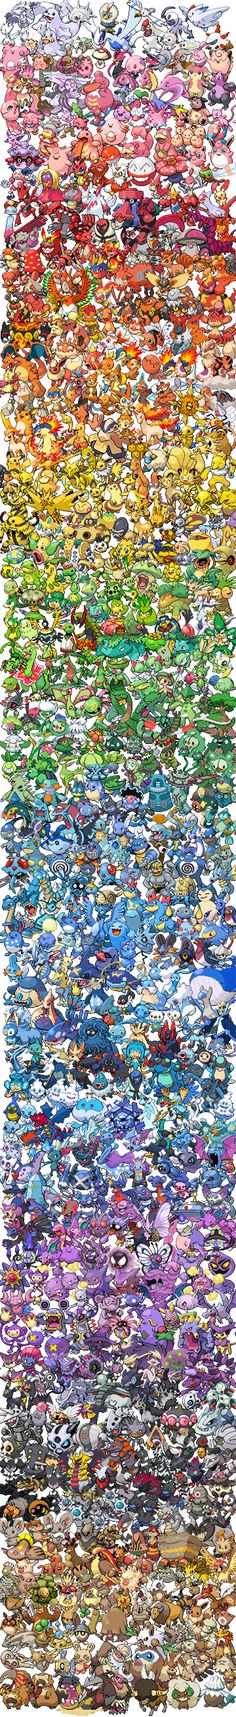 Shades of Pokémon.